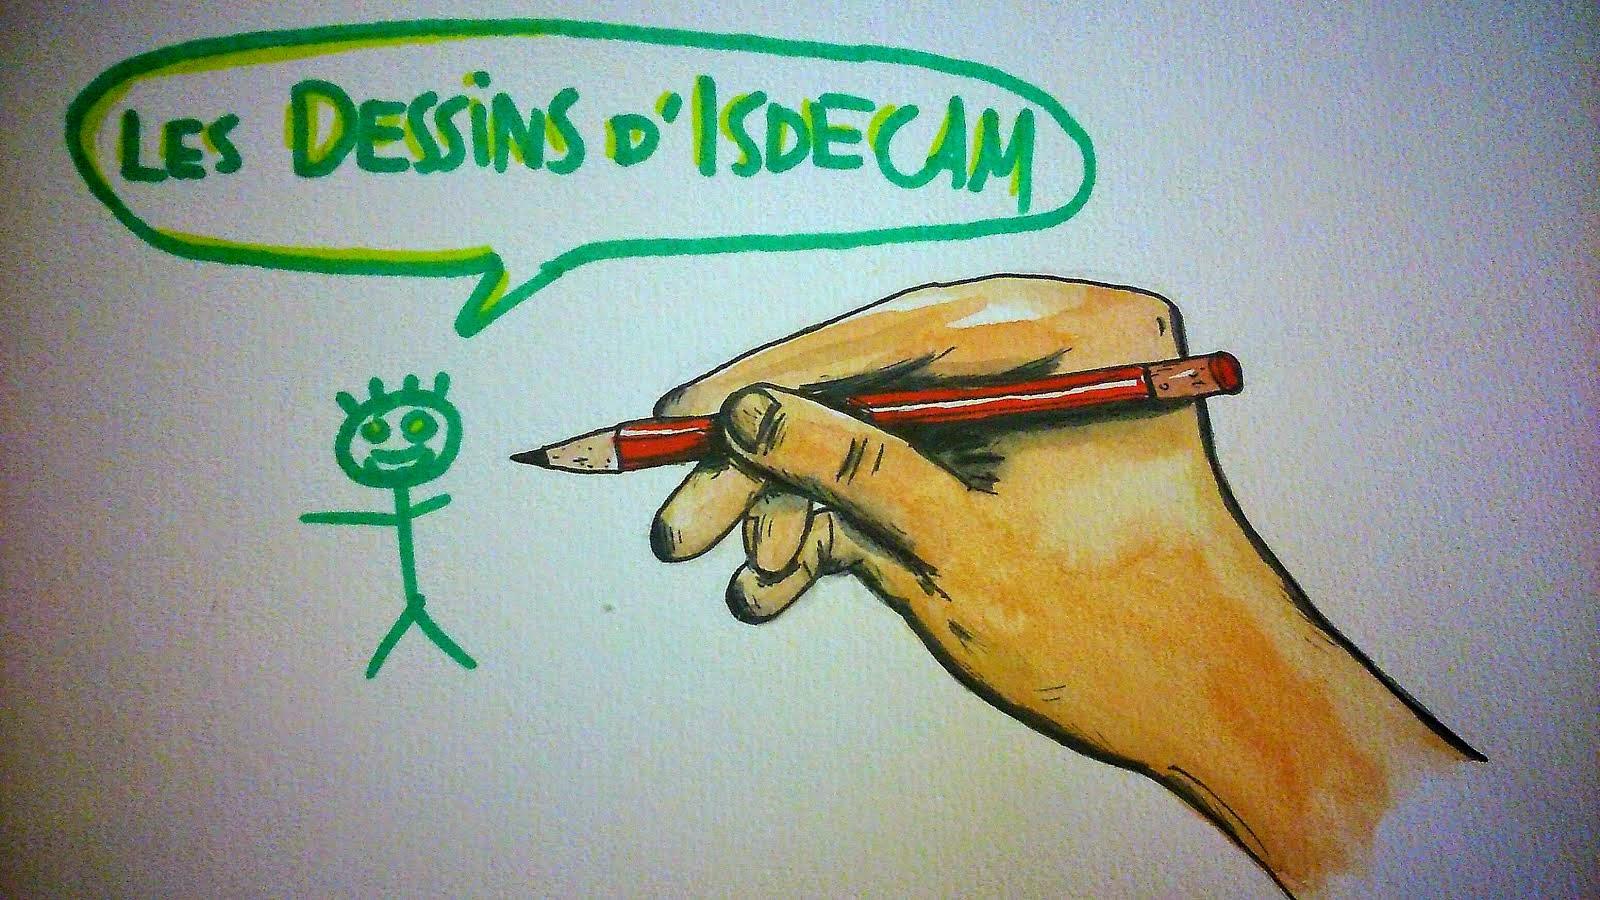 Les dessins d'ISDECAM